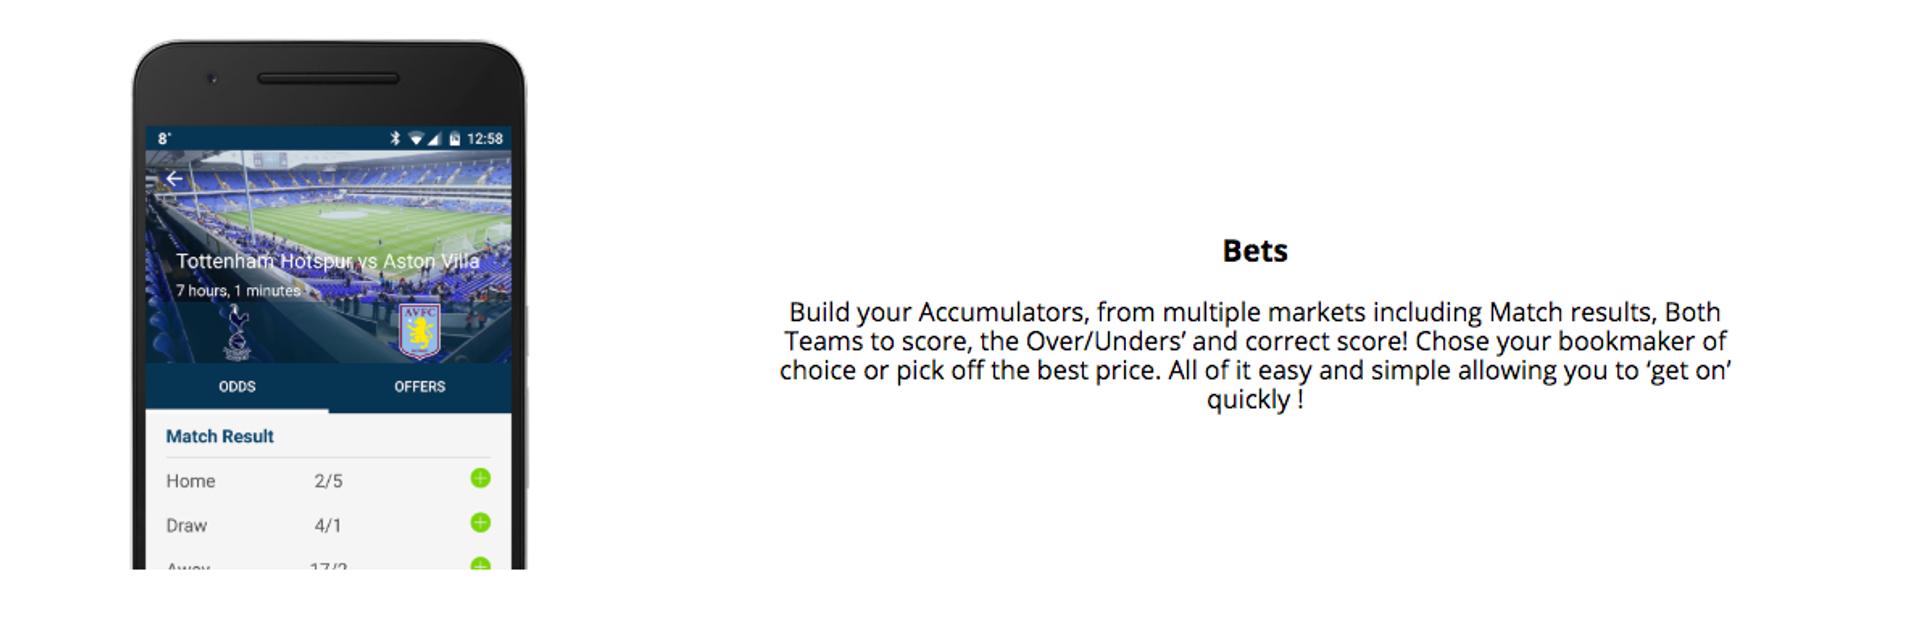 Acca Tracker App | Download Acca Tracker | Footy Accumulators